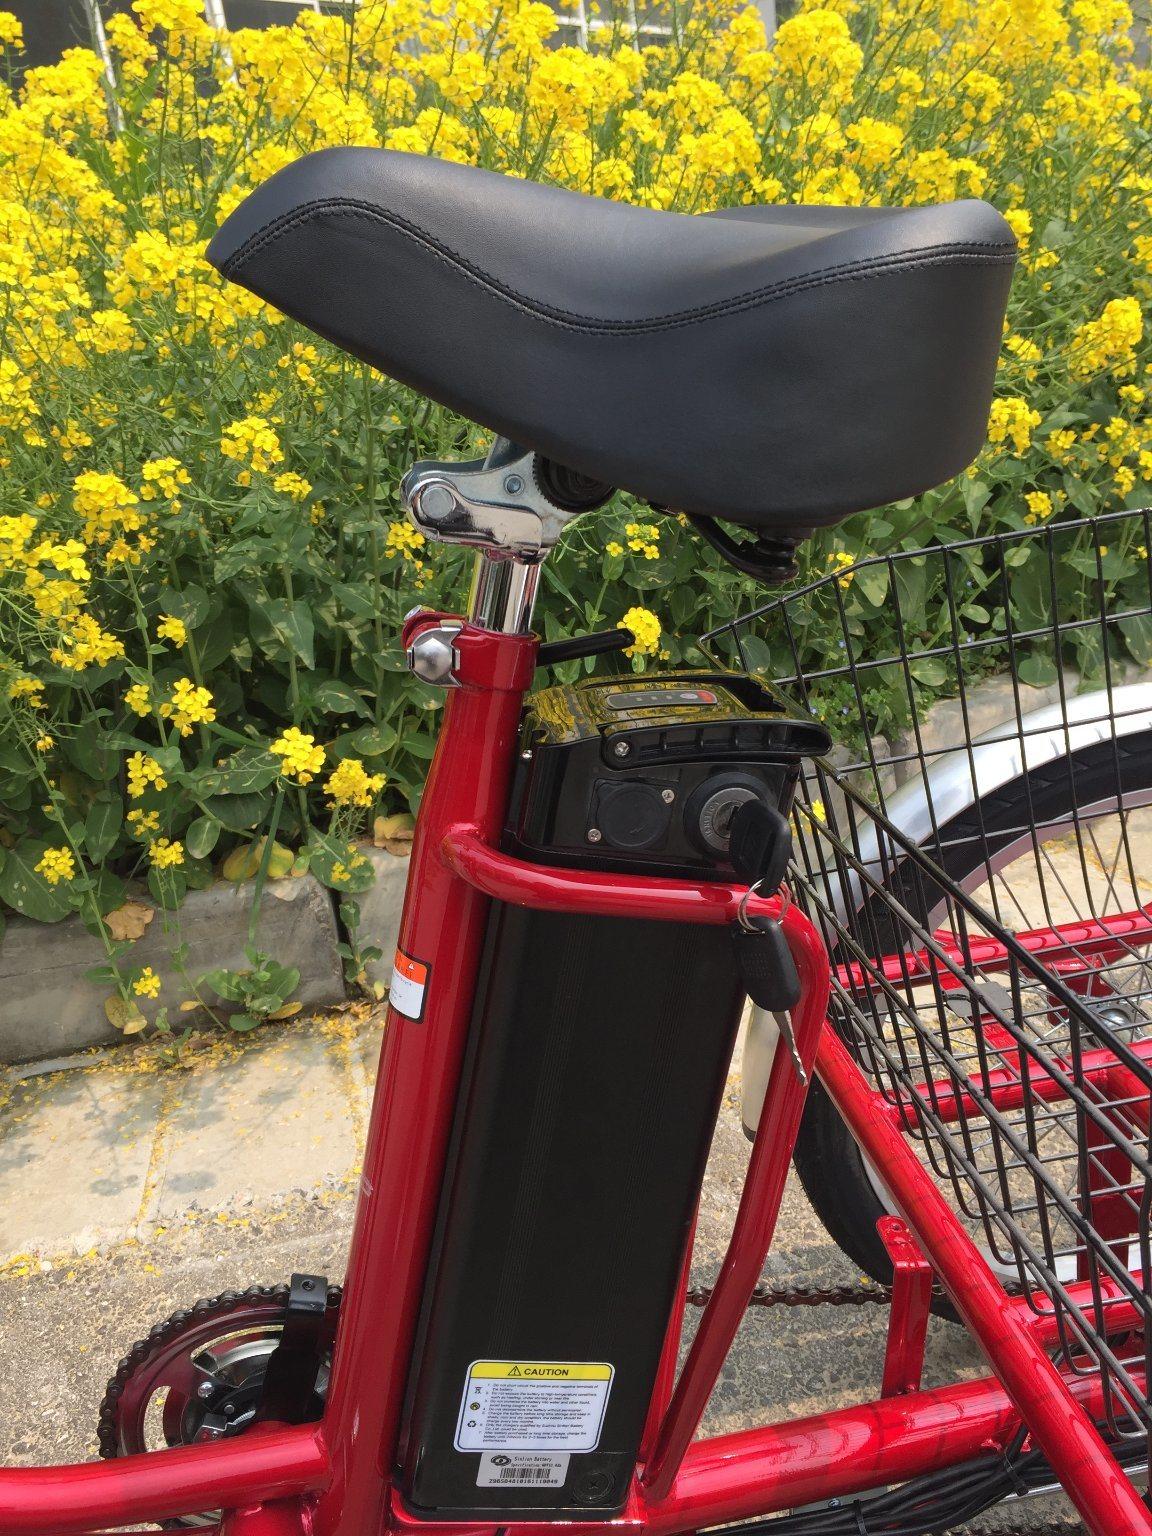 2017 Hot Sale Electrci Trike 3 Wheel E Tricycle with Big Basket